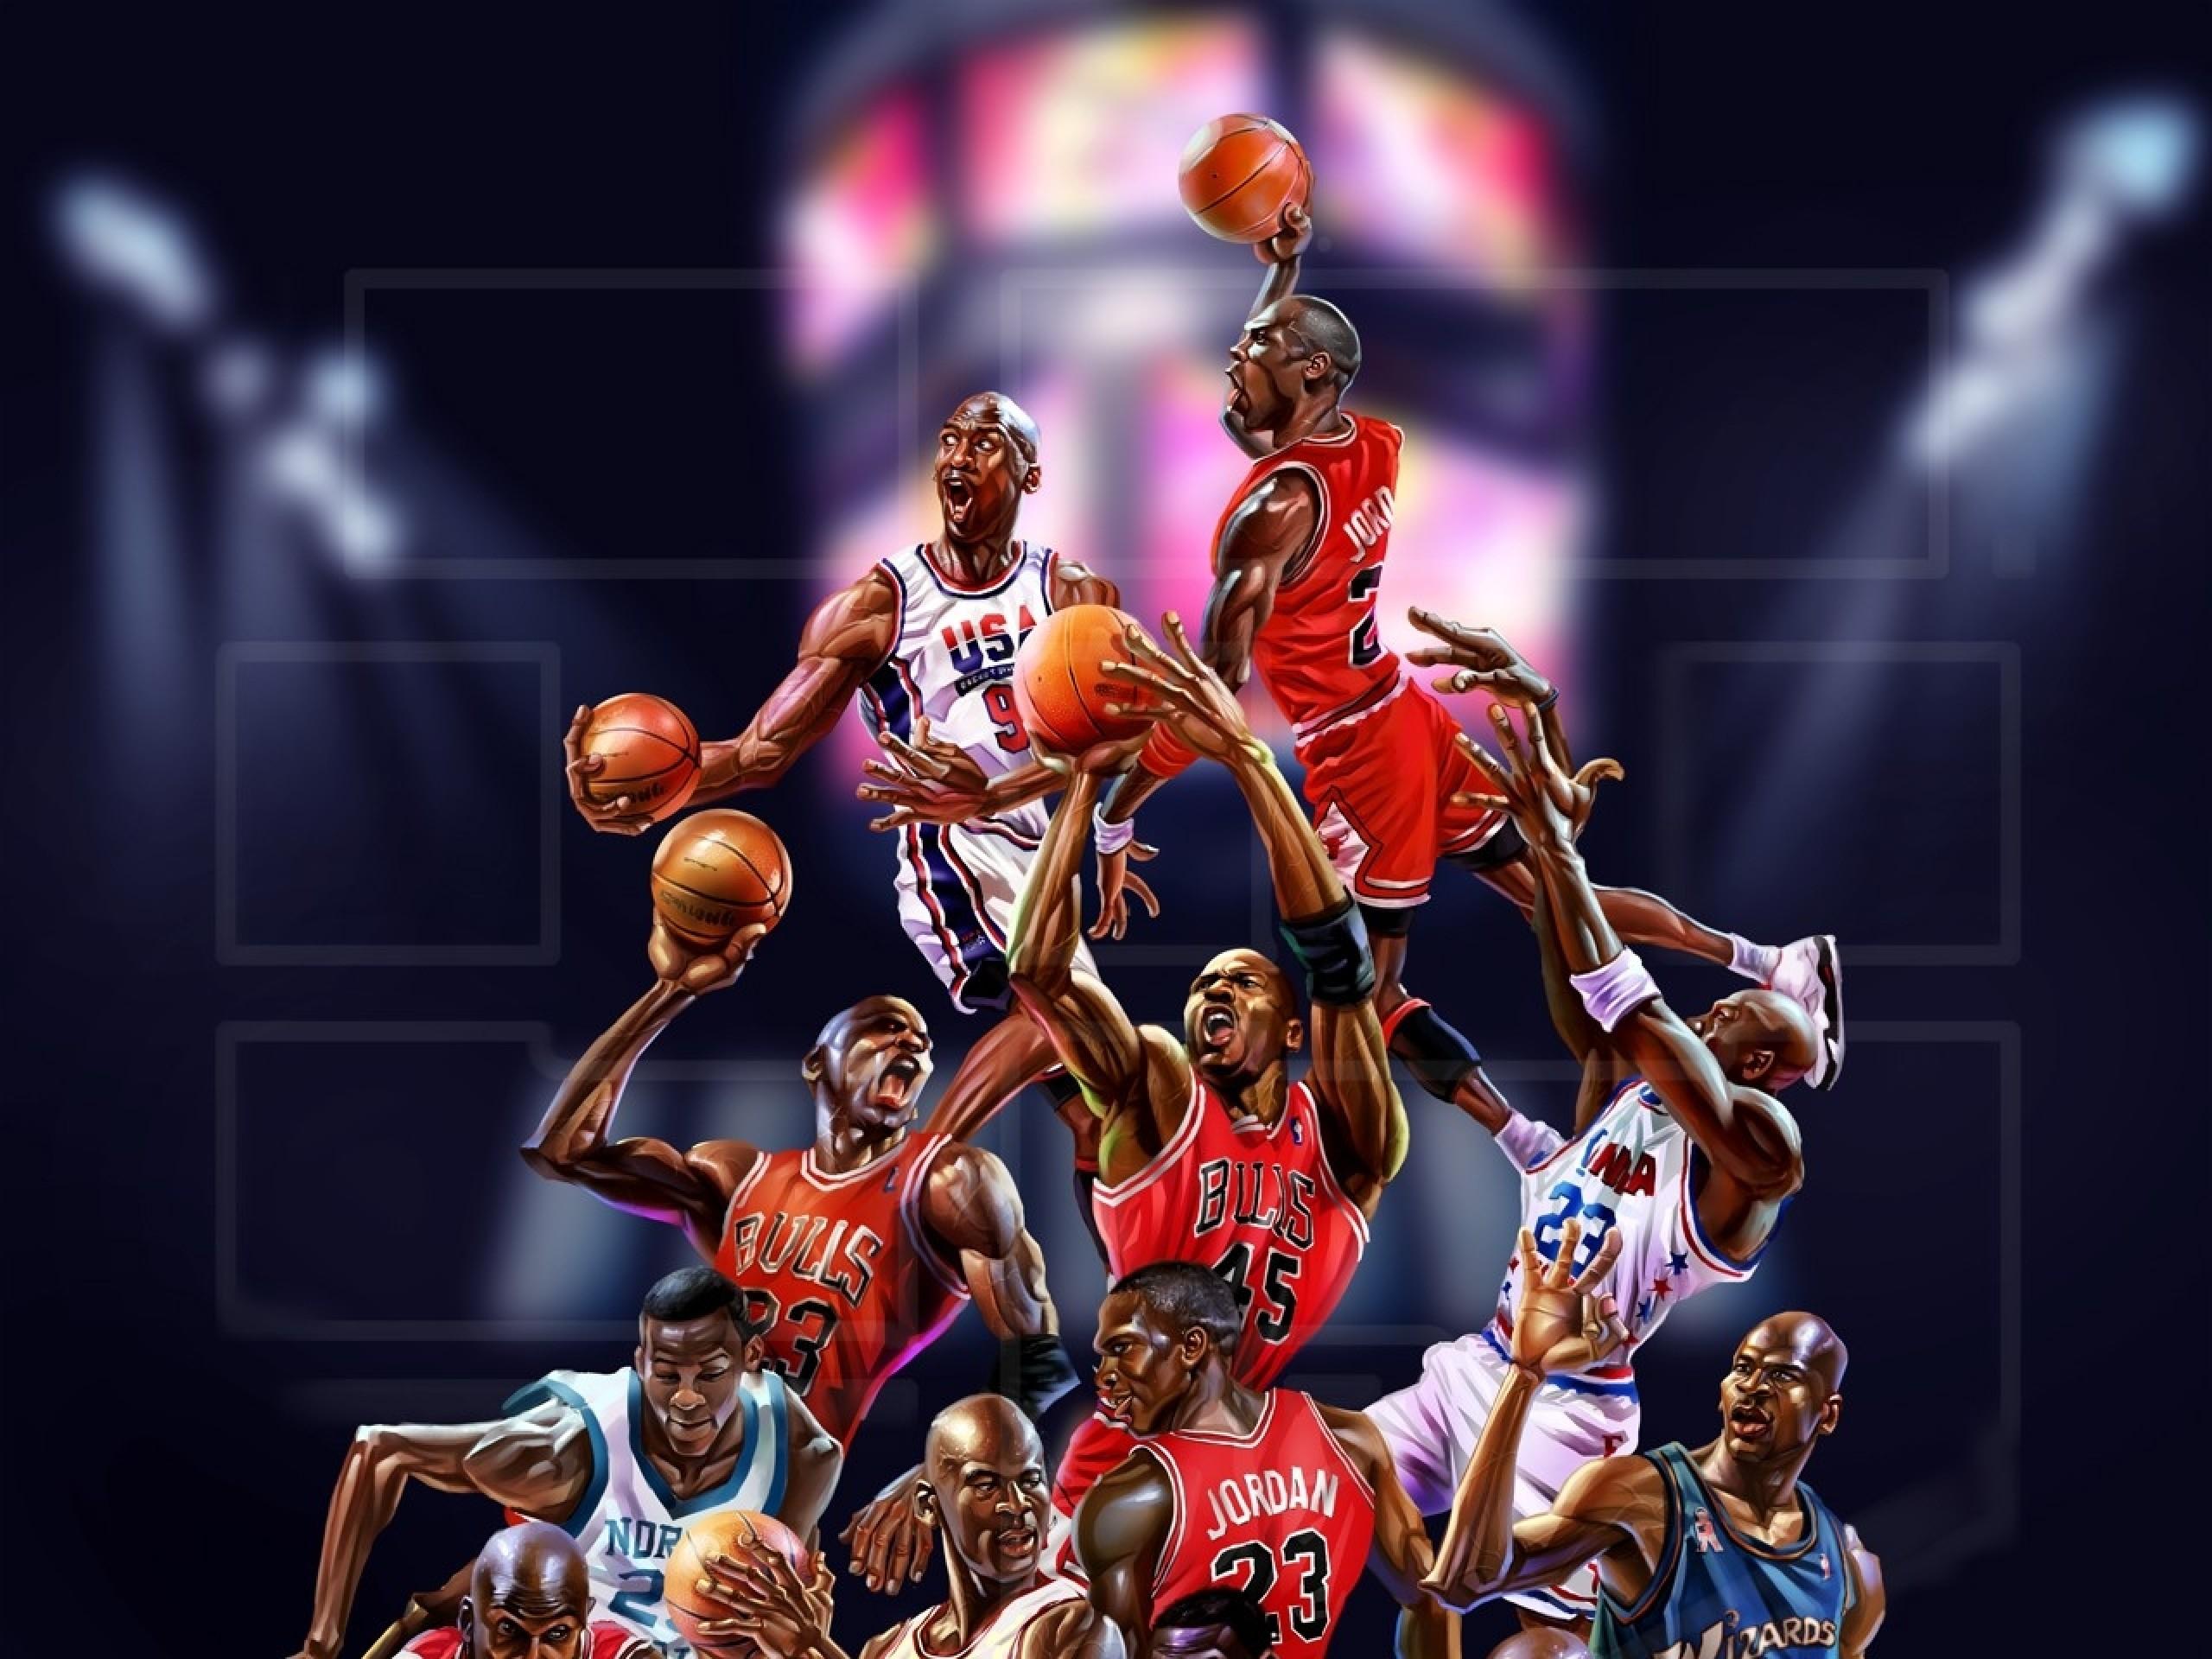 … NBA Wallpapers HD 12 …